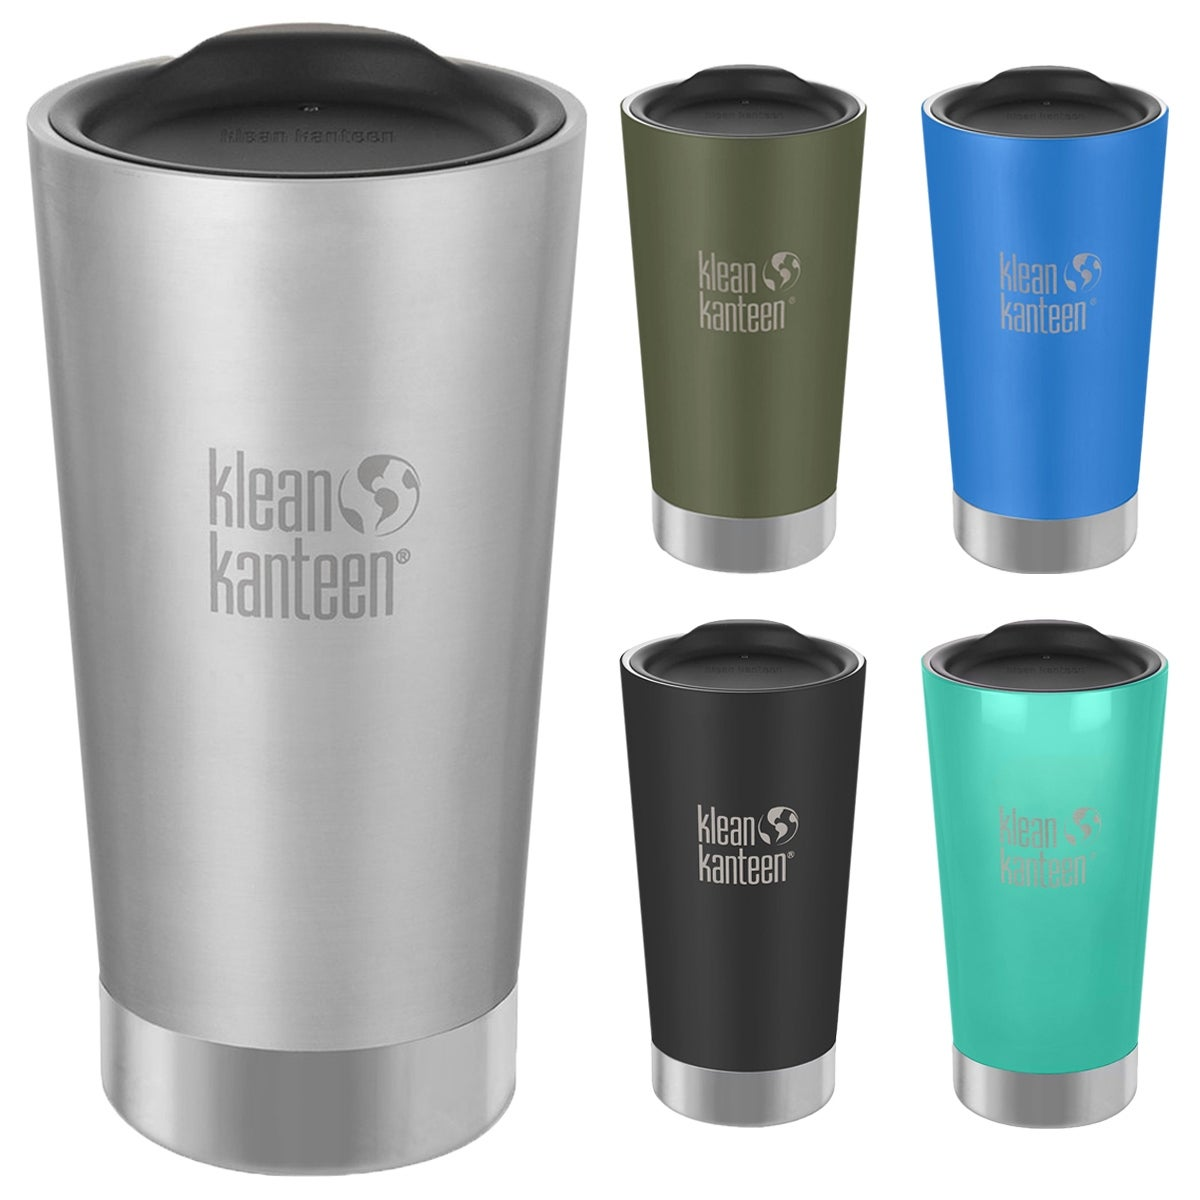 Klean Kanteen Insulated Tumbler 16Oz Water Bottle